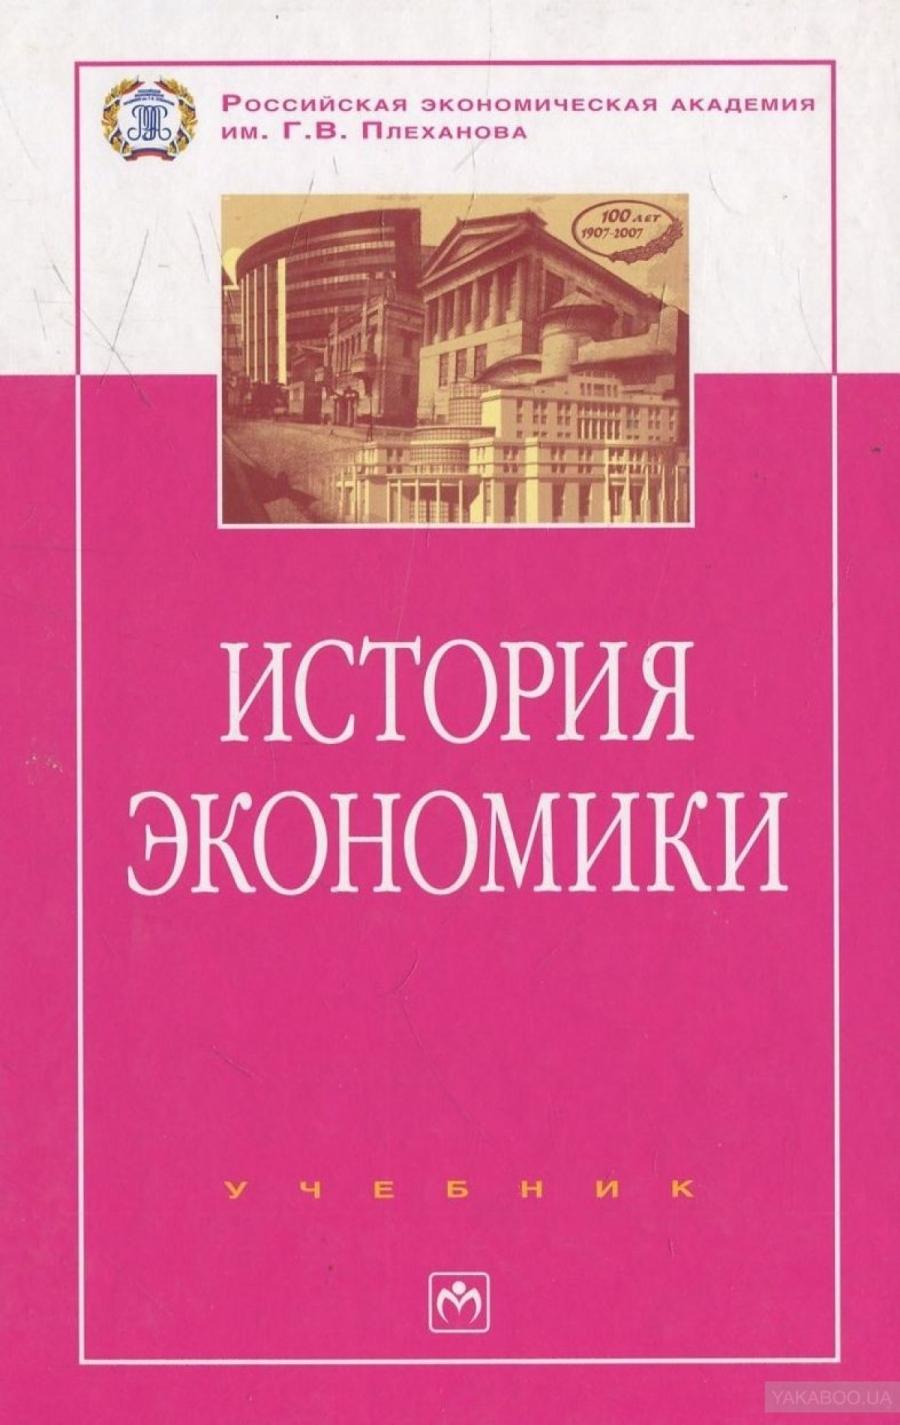 Обложка книги:  в. к. скляренко, в. м. прудников - экономика предприятия